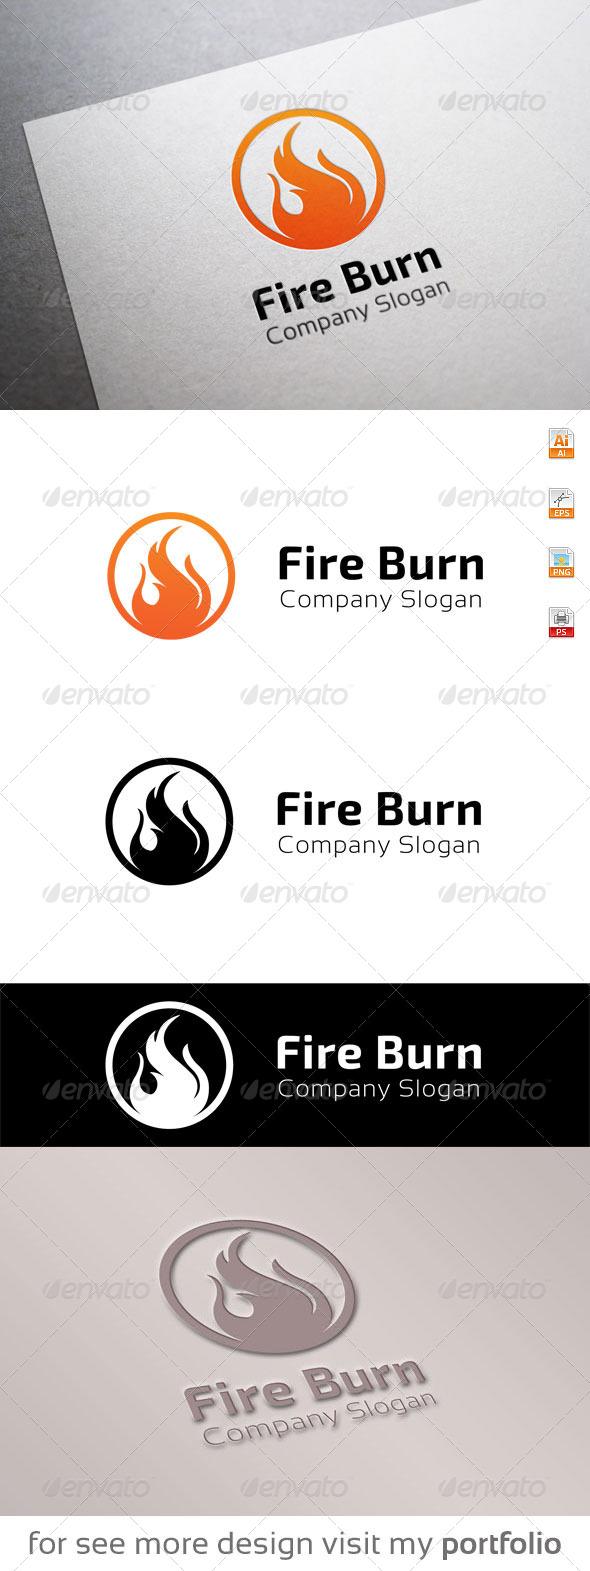 GraphicRiver Fire Burn logo 8679653